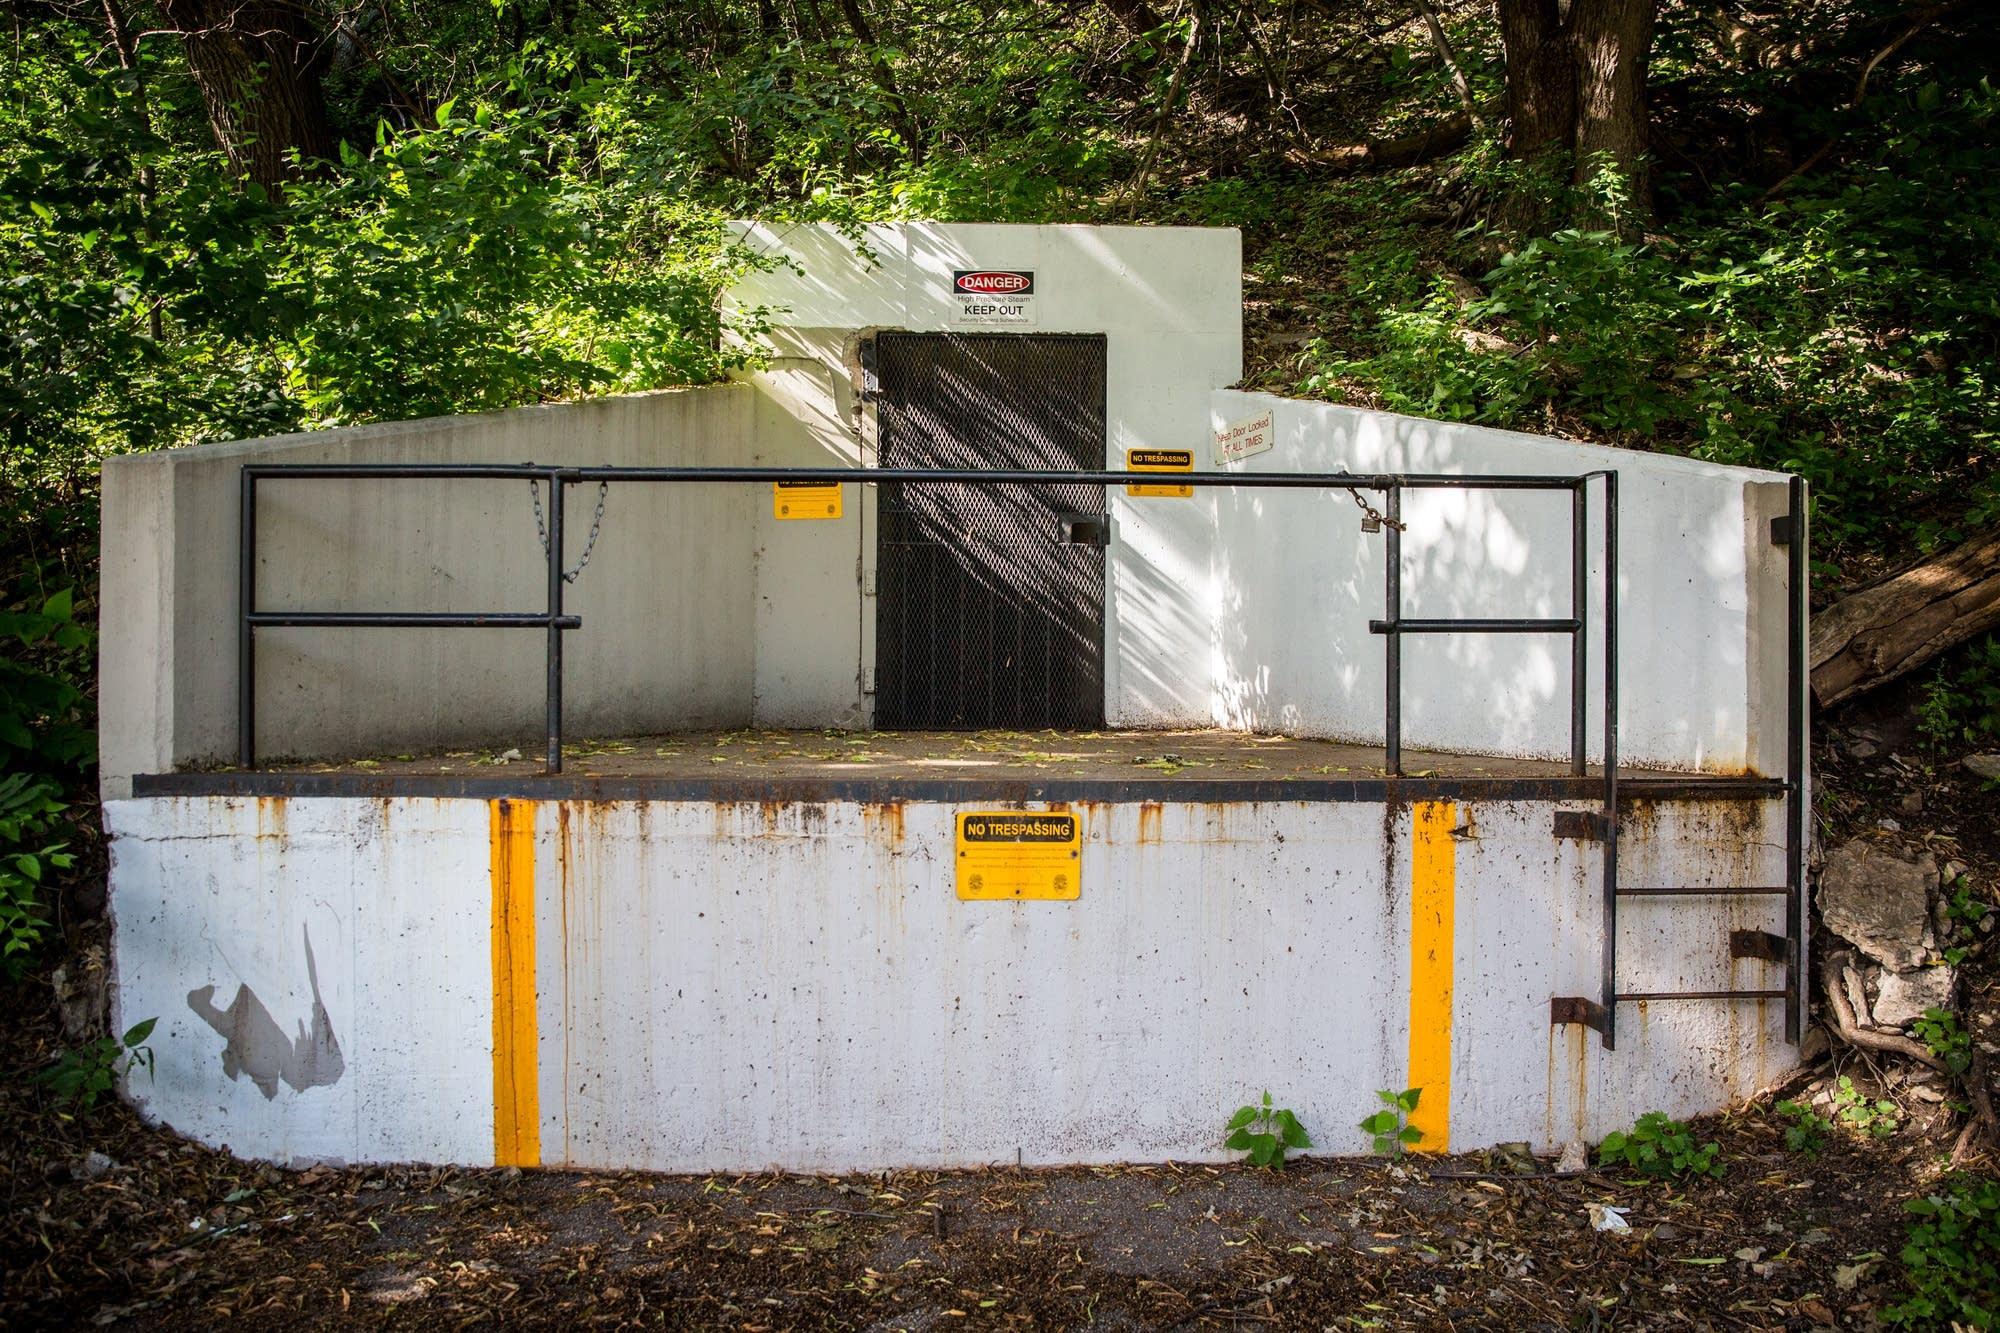 A steam tunnel entrance